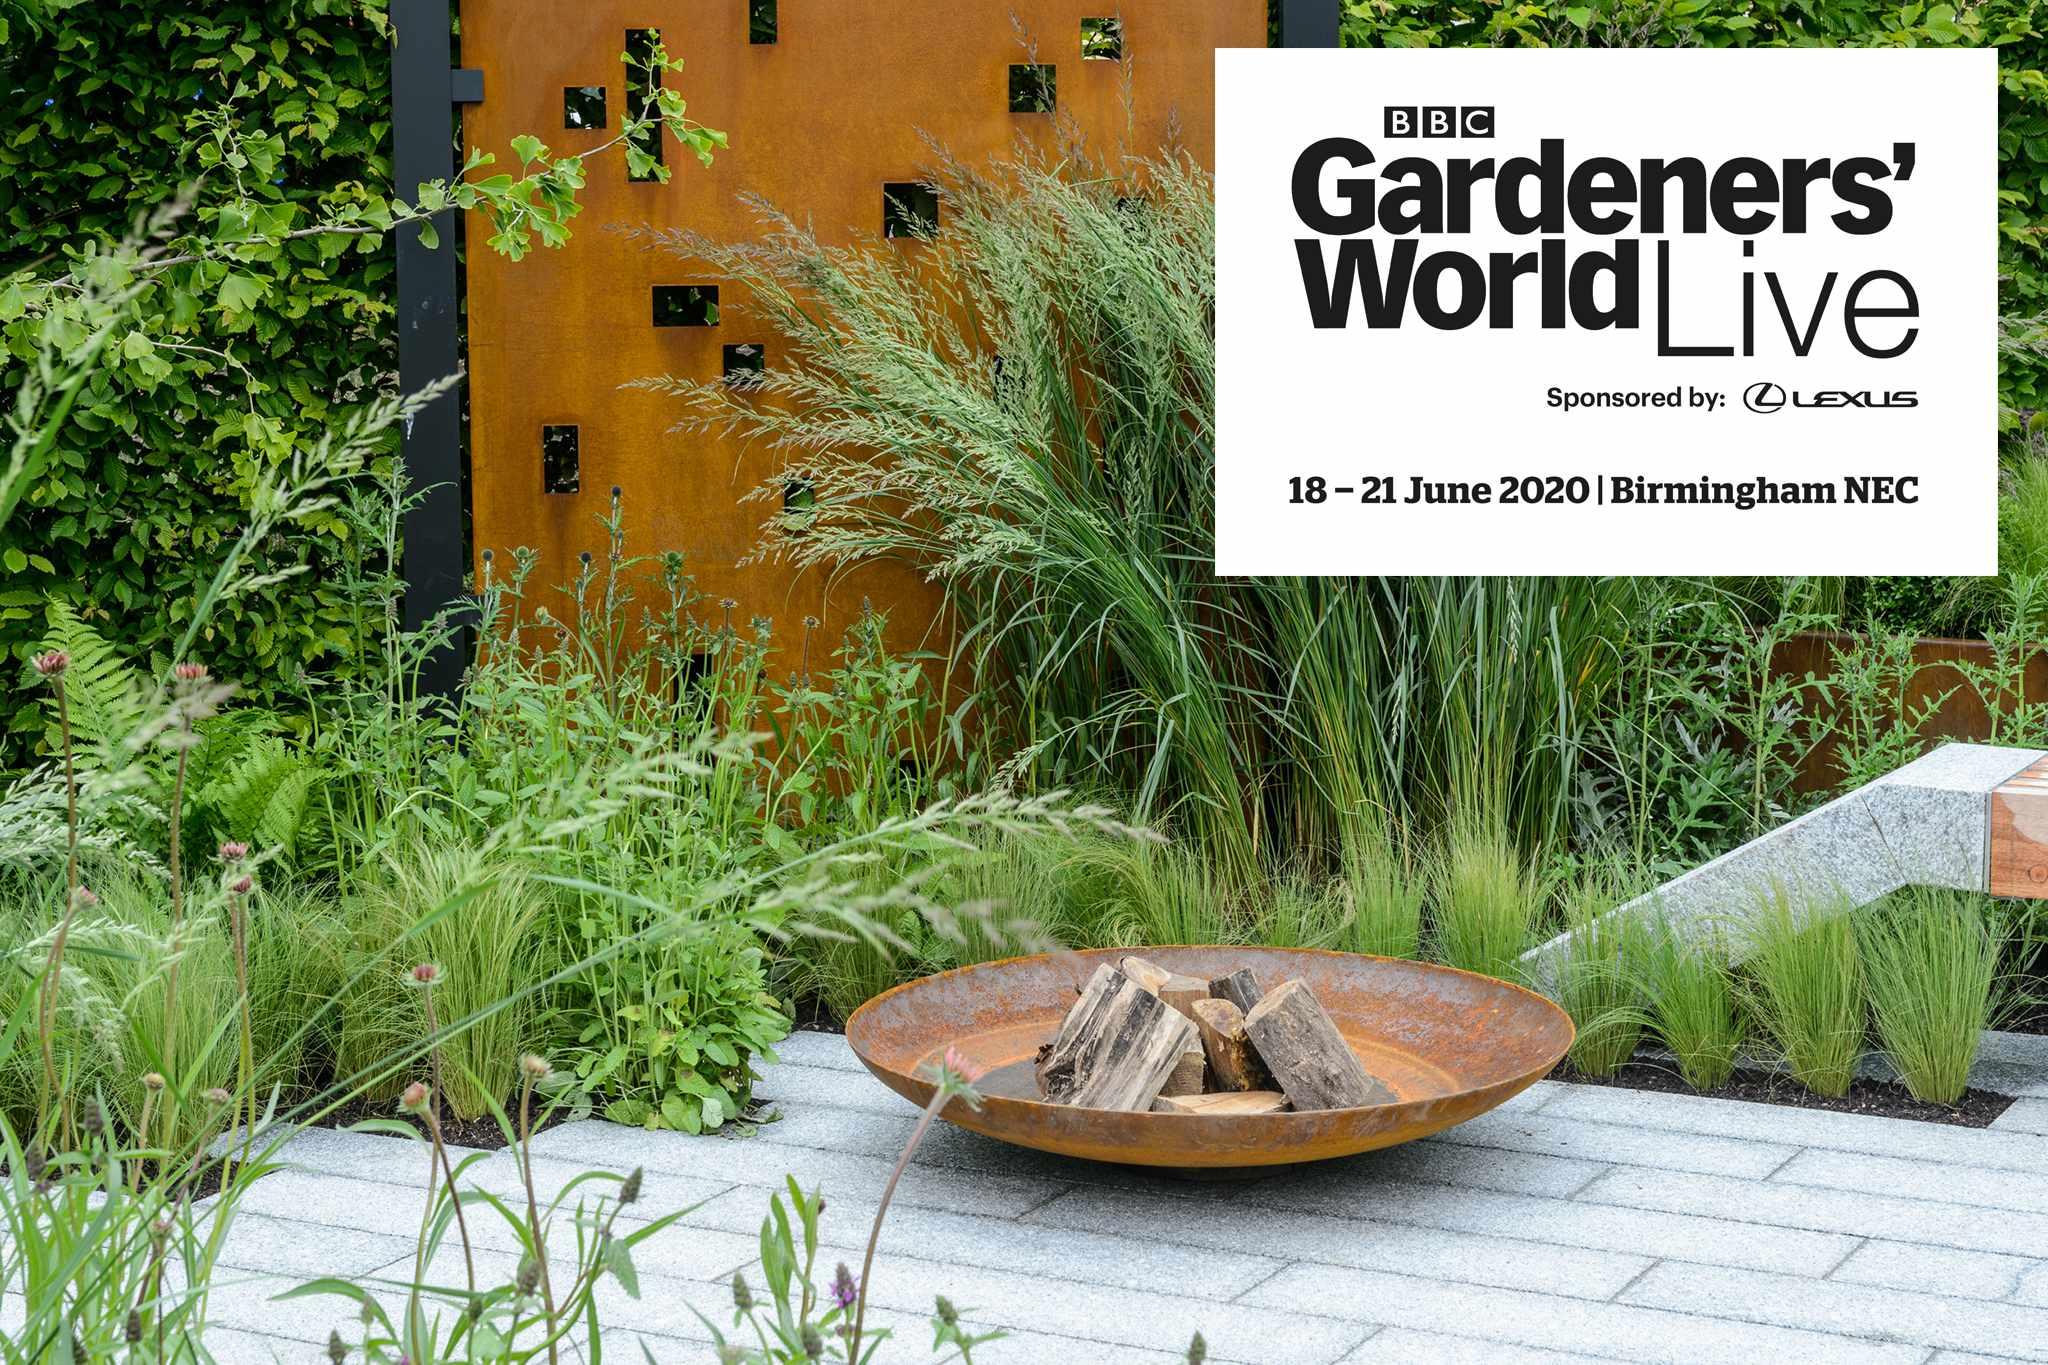 BBC Gardeners' World LIve 2020